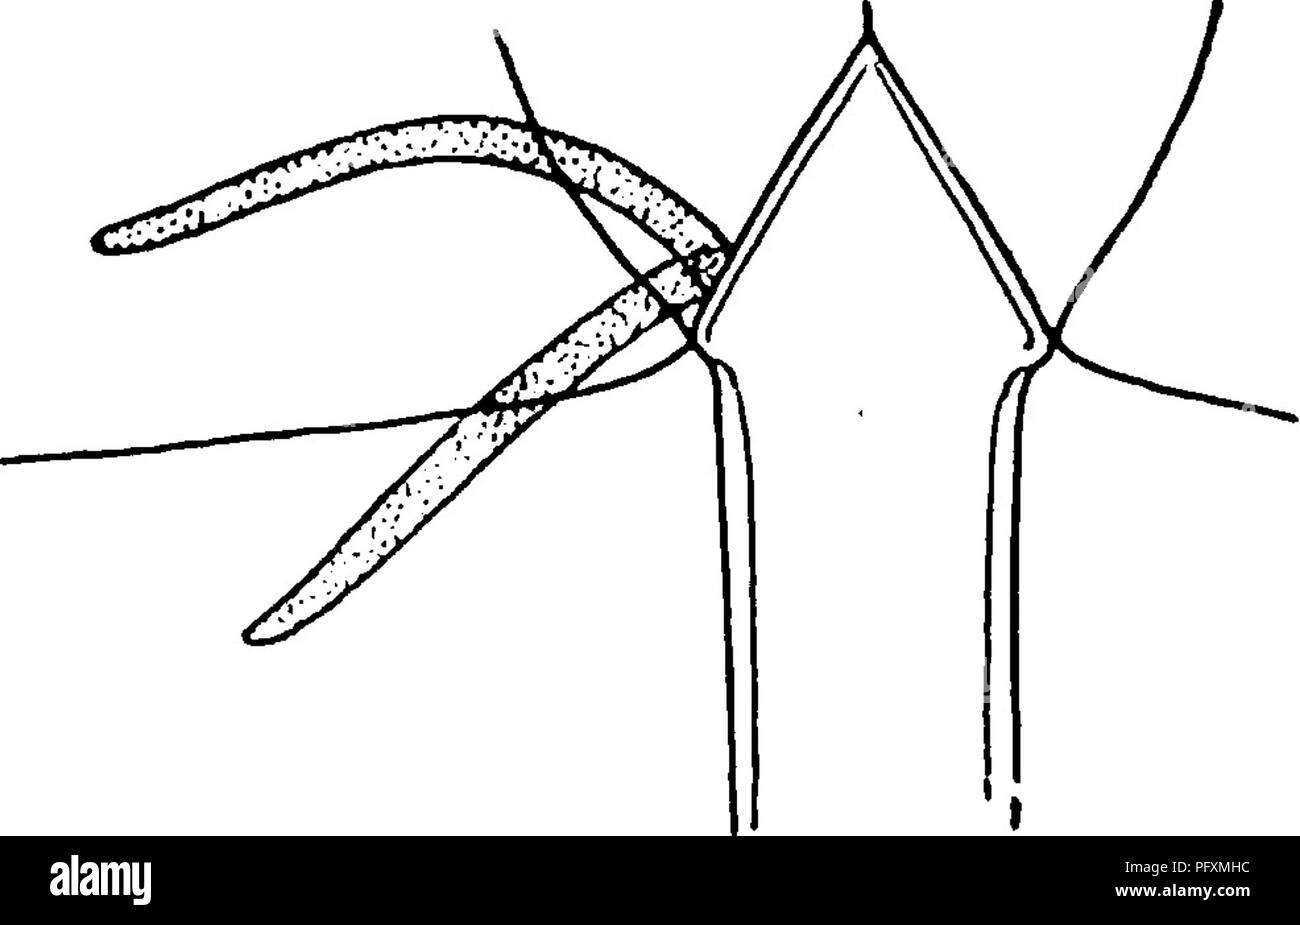 hight resolution of the eurypterida of new york eurypterida paleontology figure i8 diagram to indicate